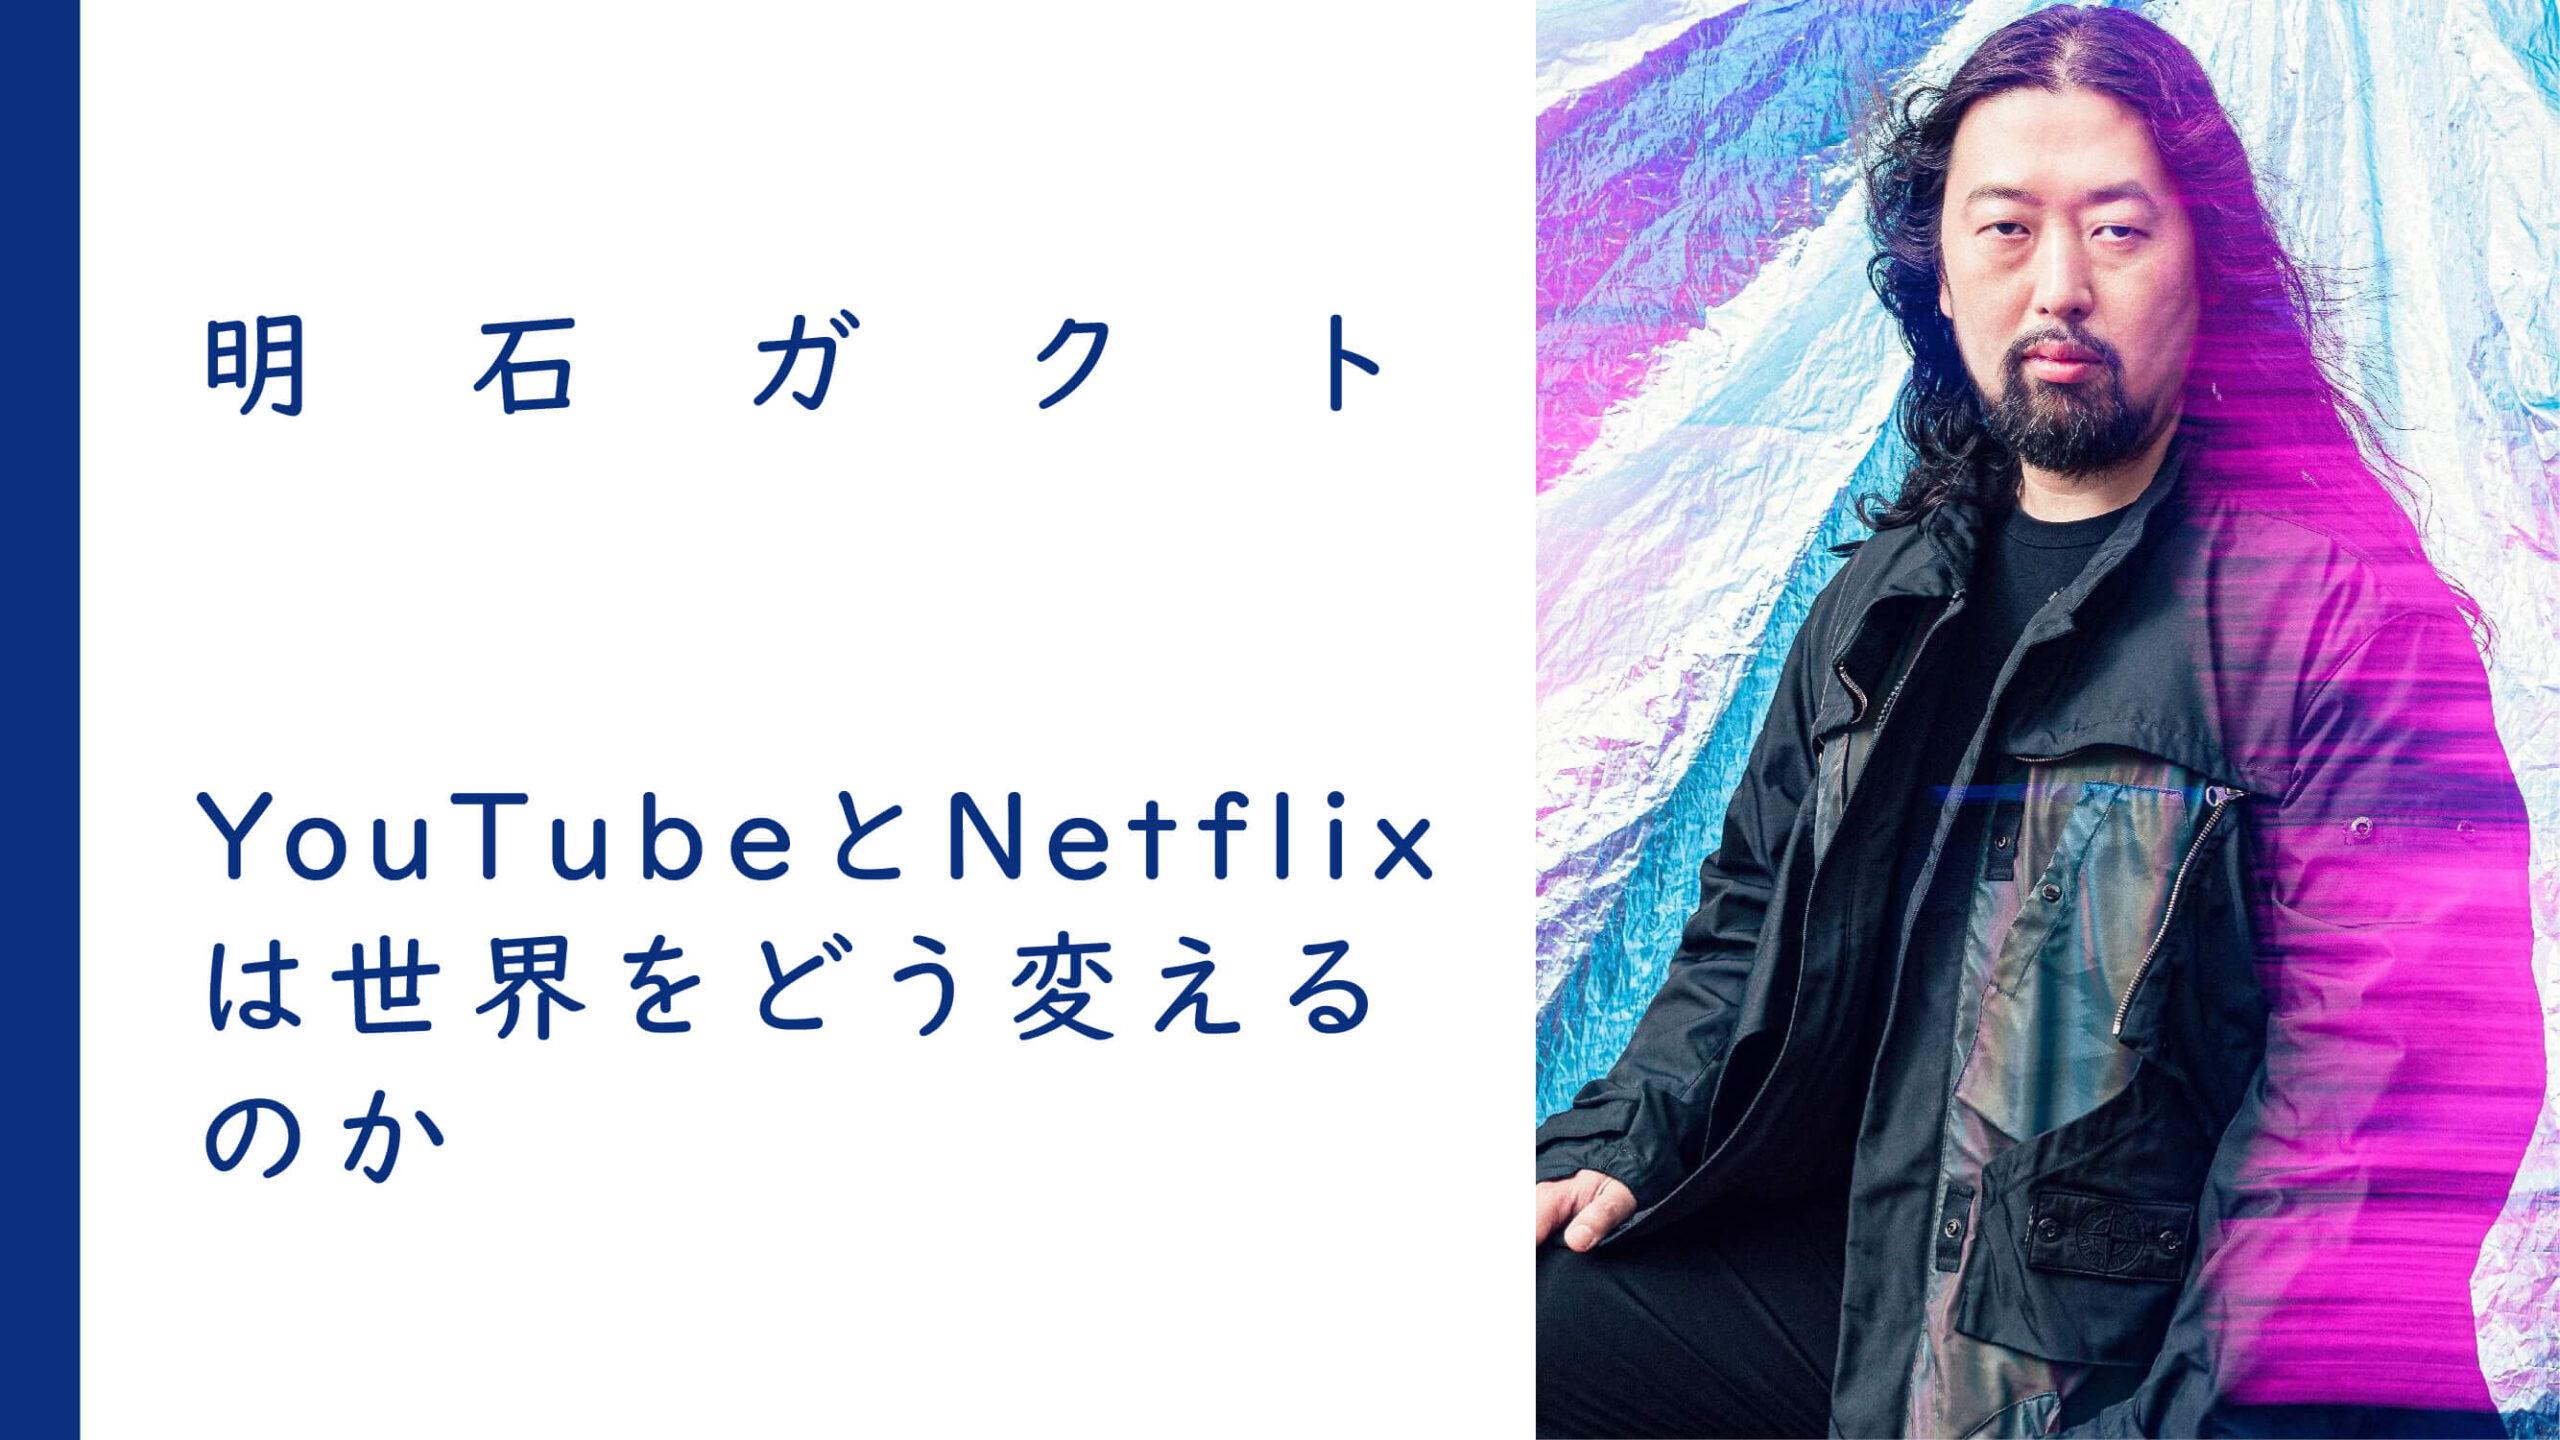 YouTubeとNetflixは世界をどう変えるのか | 明石ガクト<br><br>